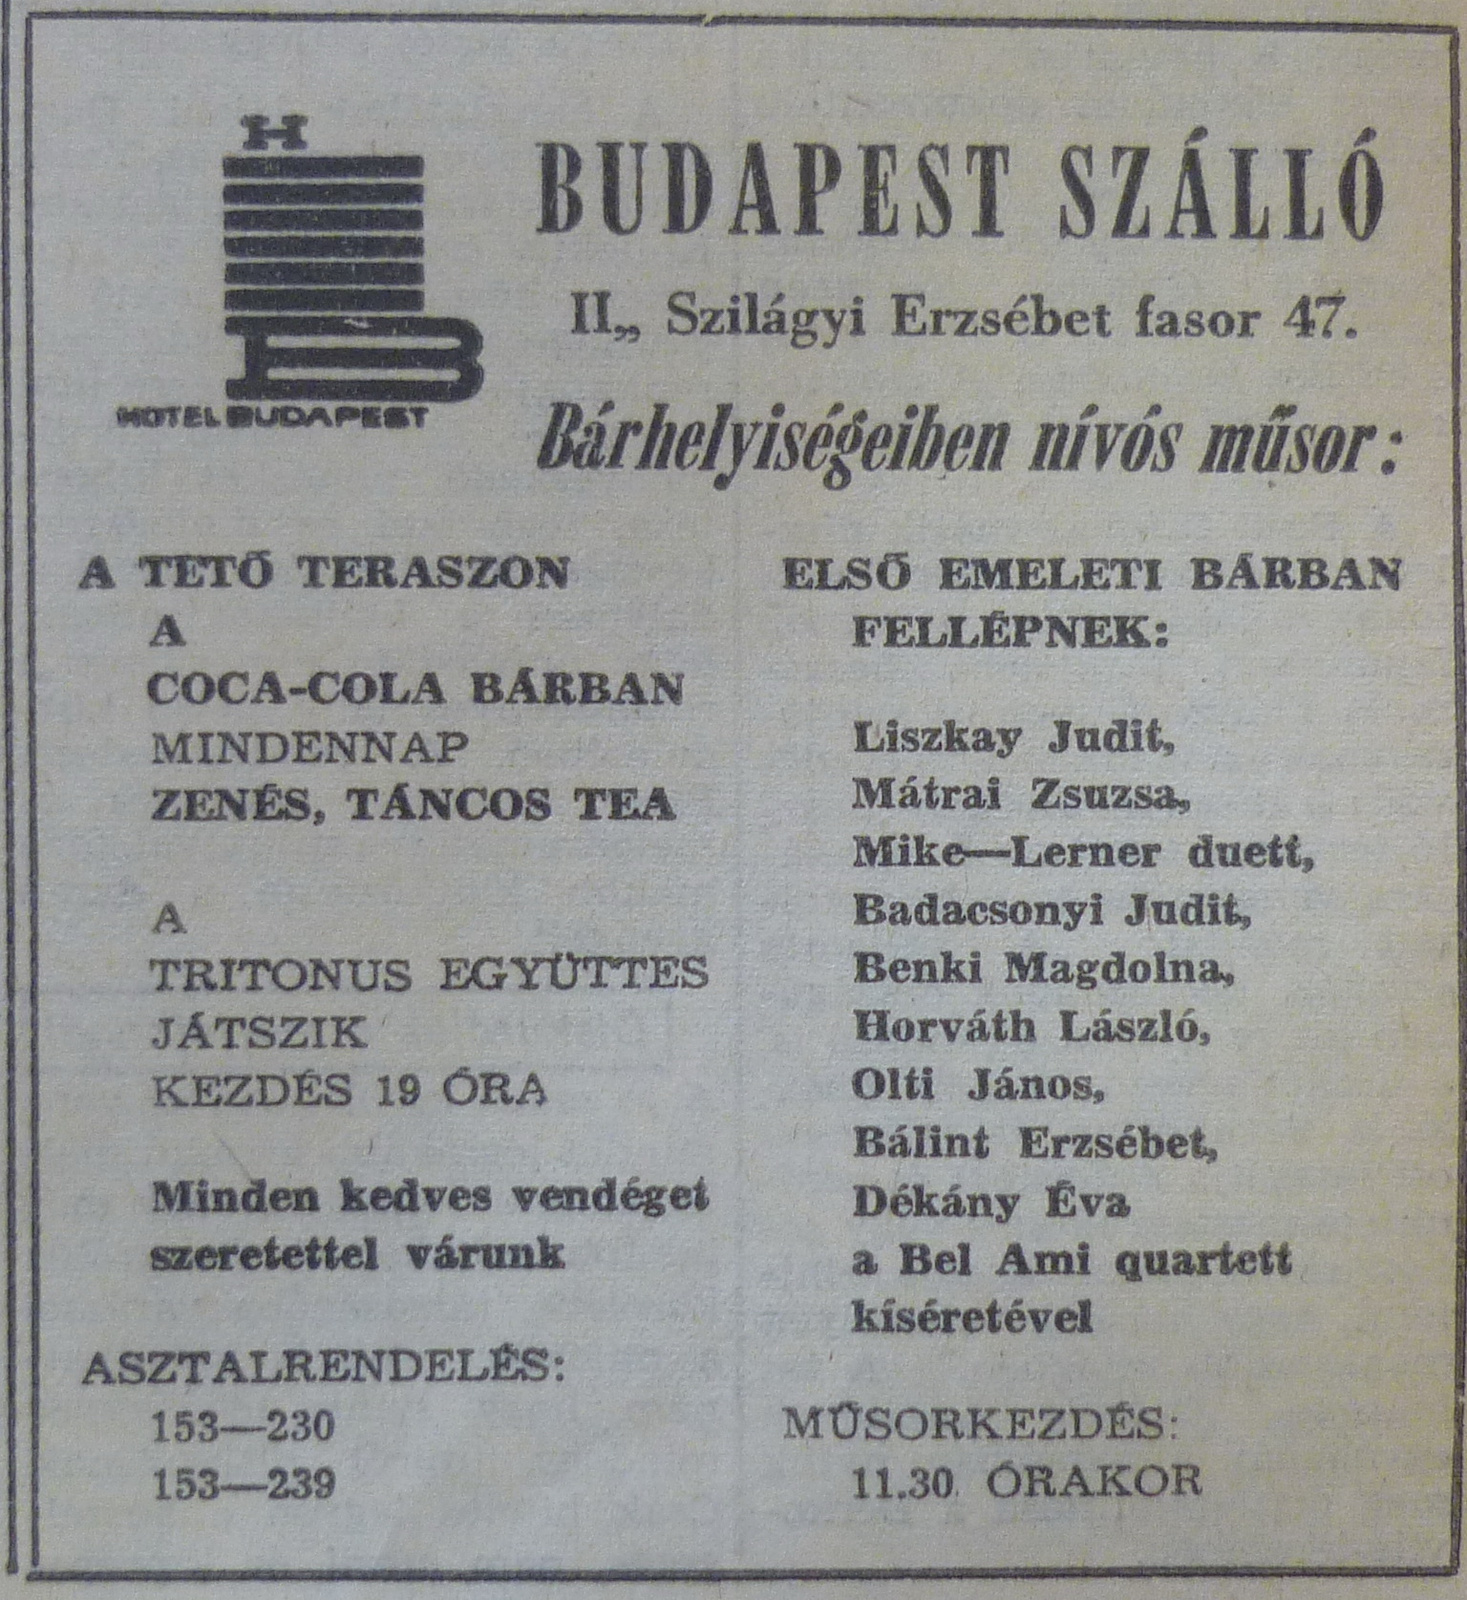 BudapestSzallo-196911-MagyarNemzetHirdetes